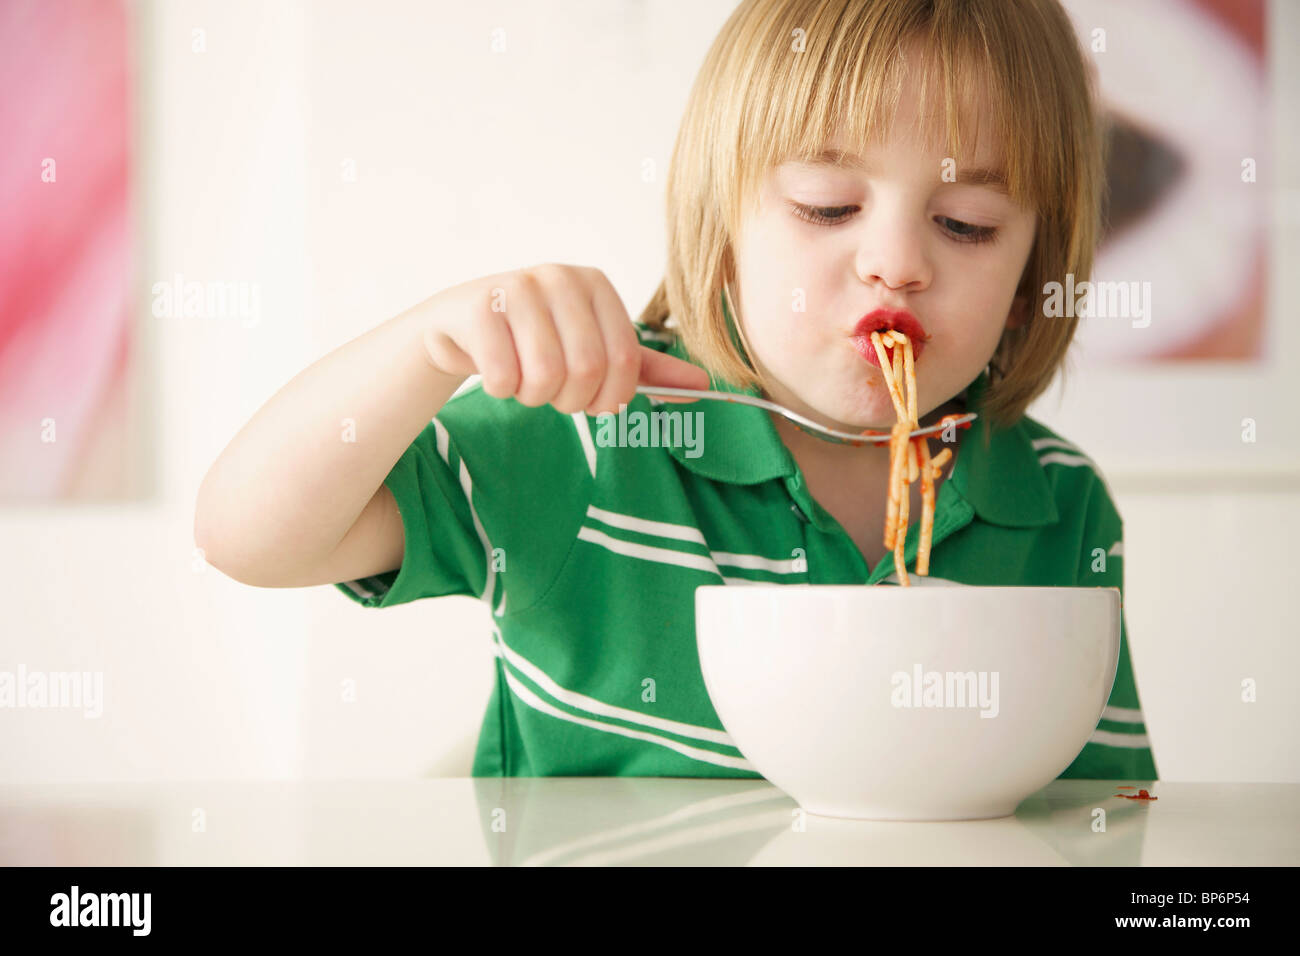 A boy eating spaghetti - Stock Image